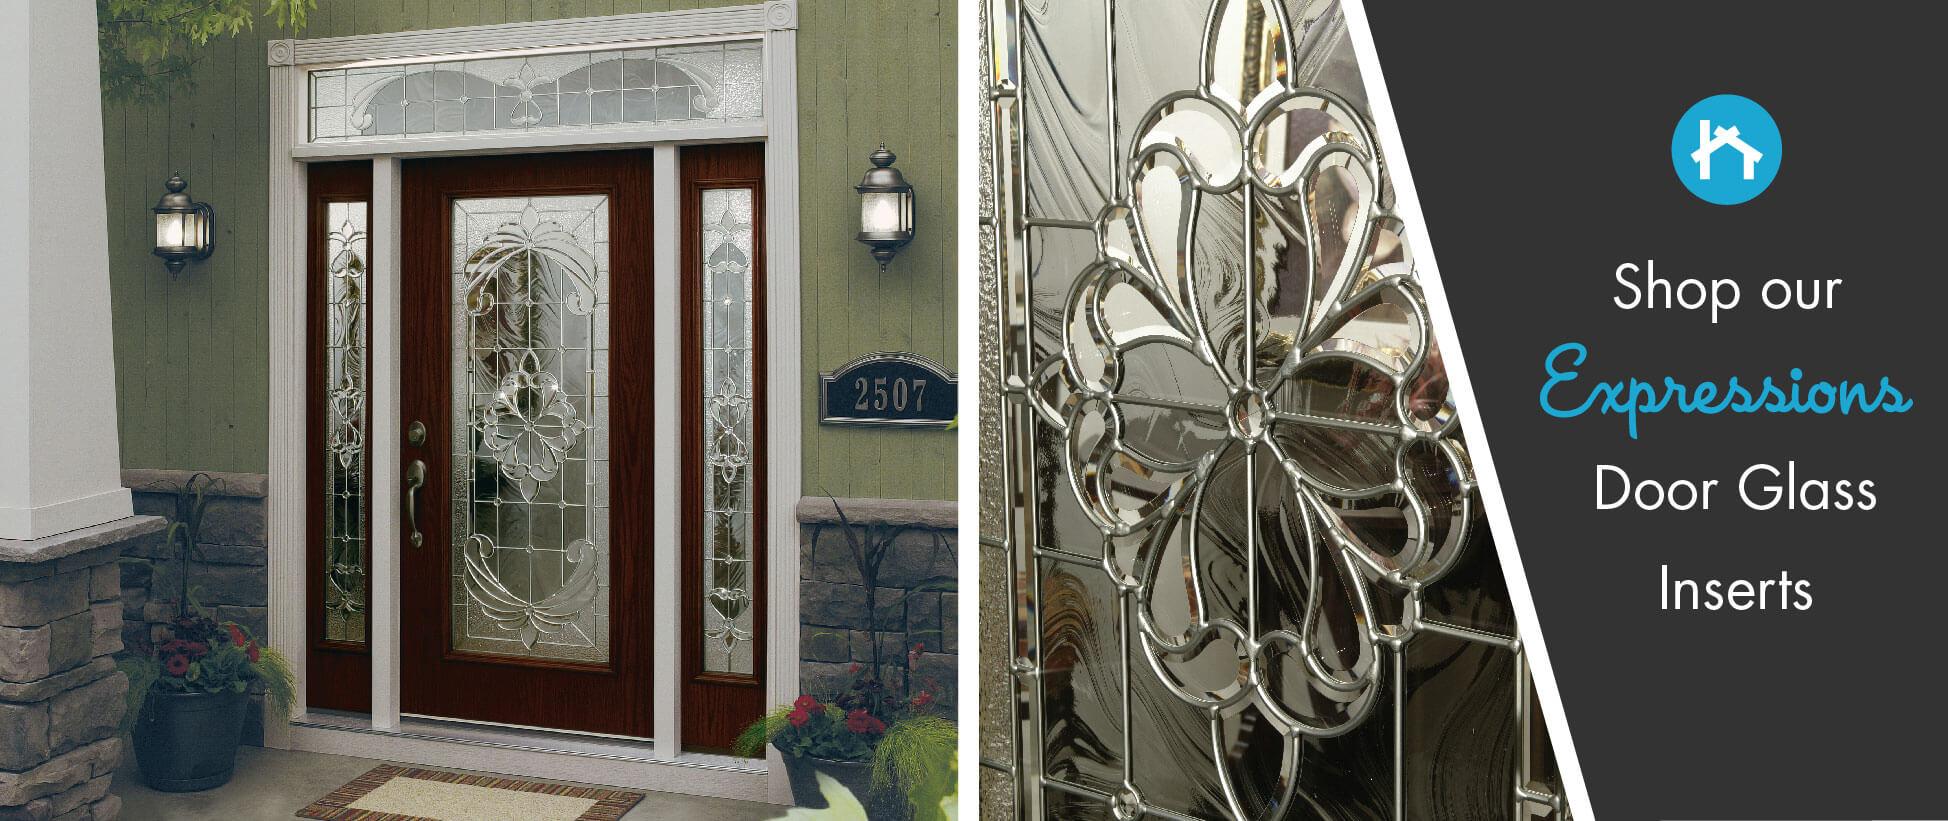 Classic Style Decorative Door Glass Inserts Odl Expressions Zabitat